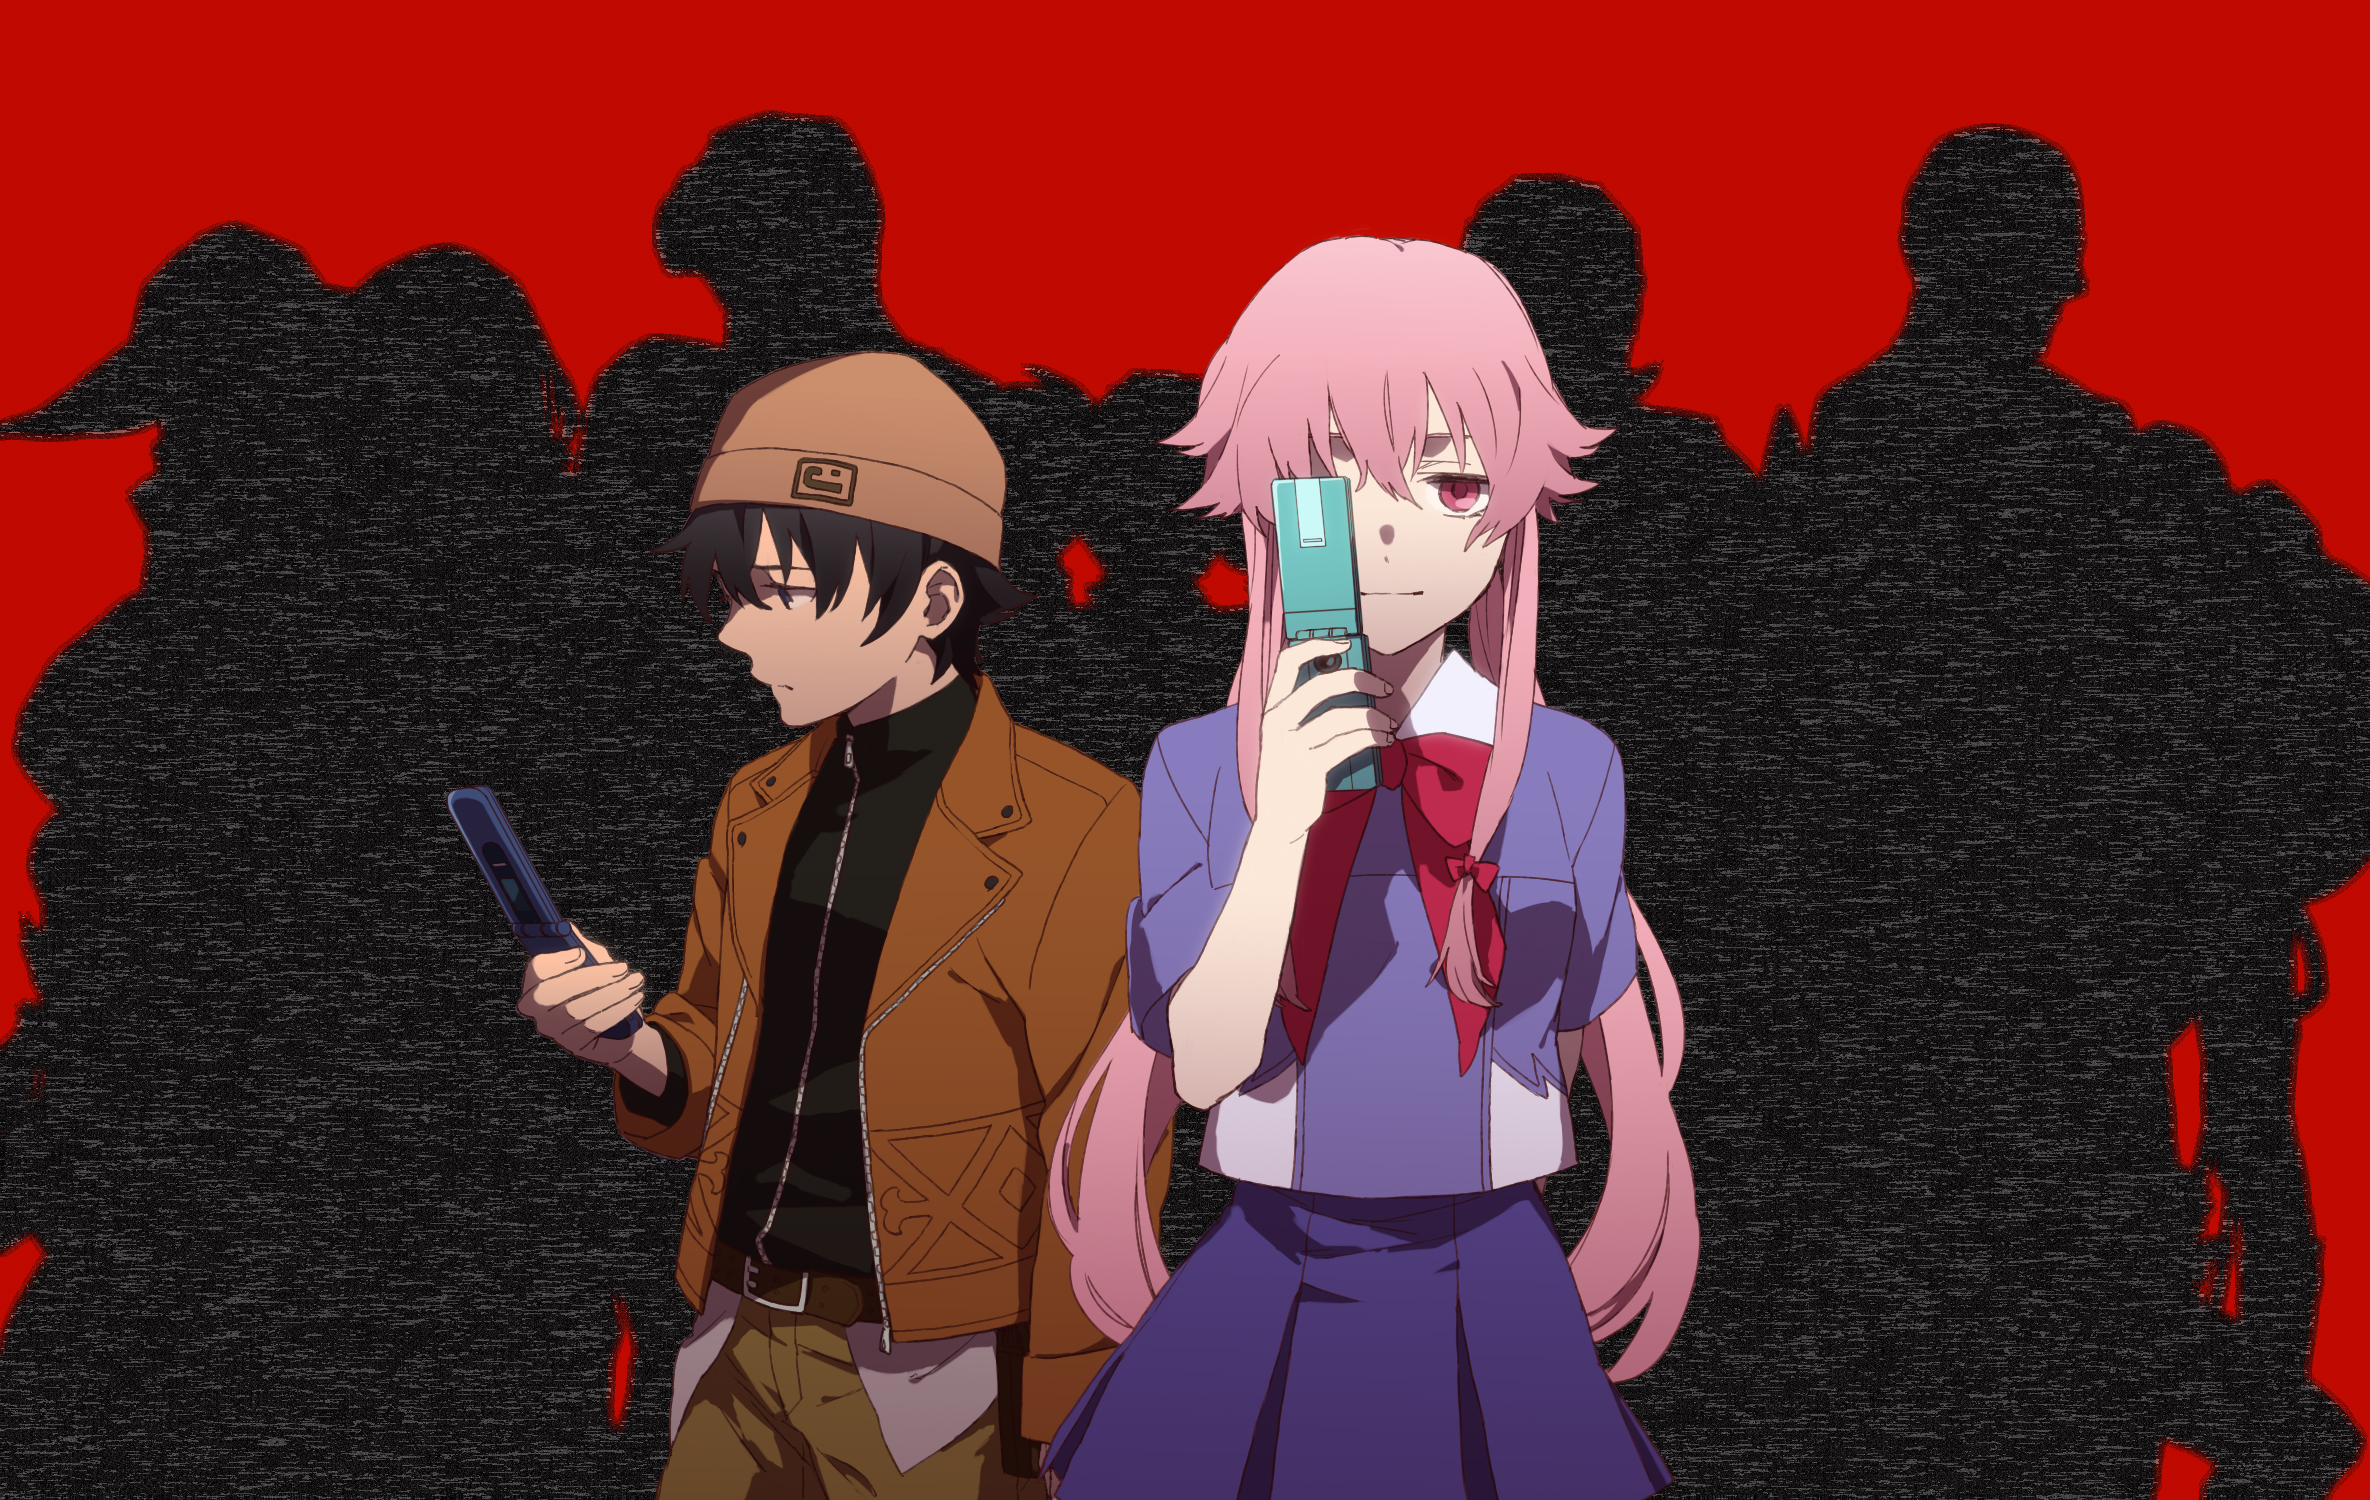 227956 - Un género, un anime - Hablemos de Anime y Manga